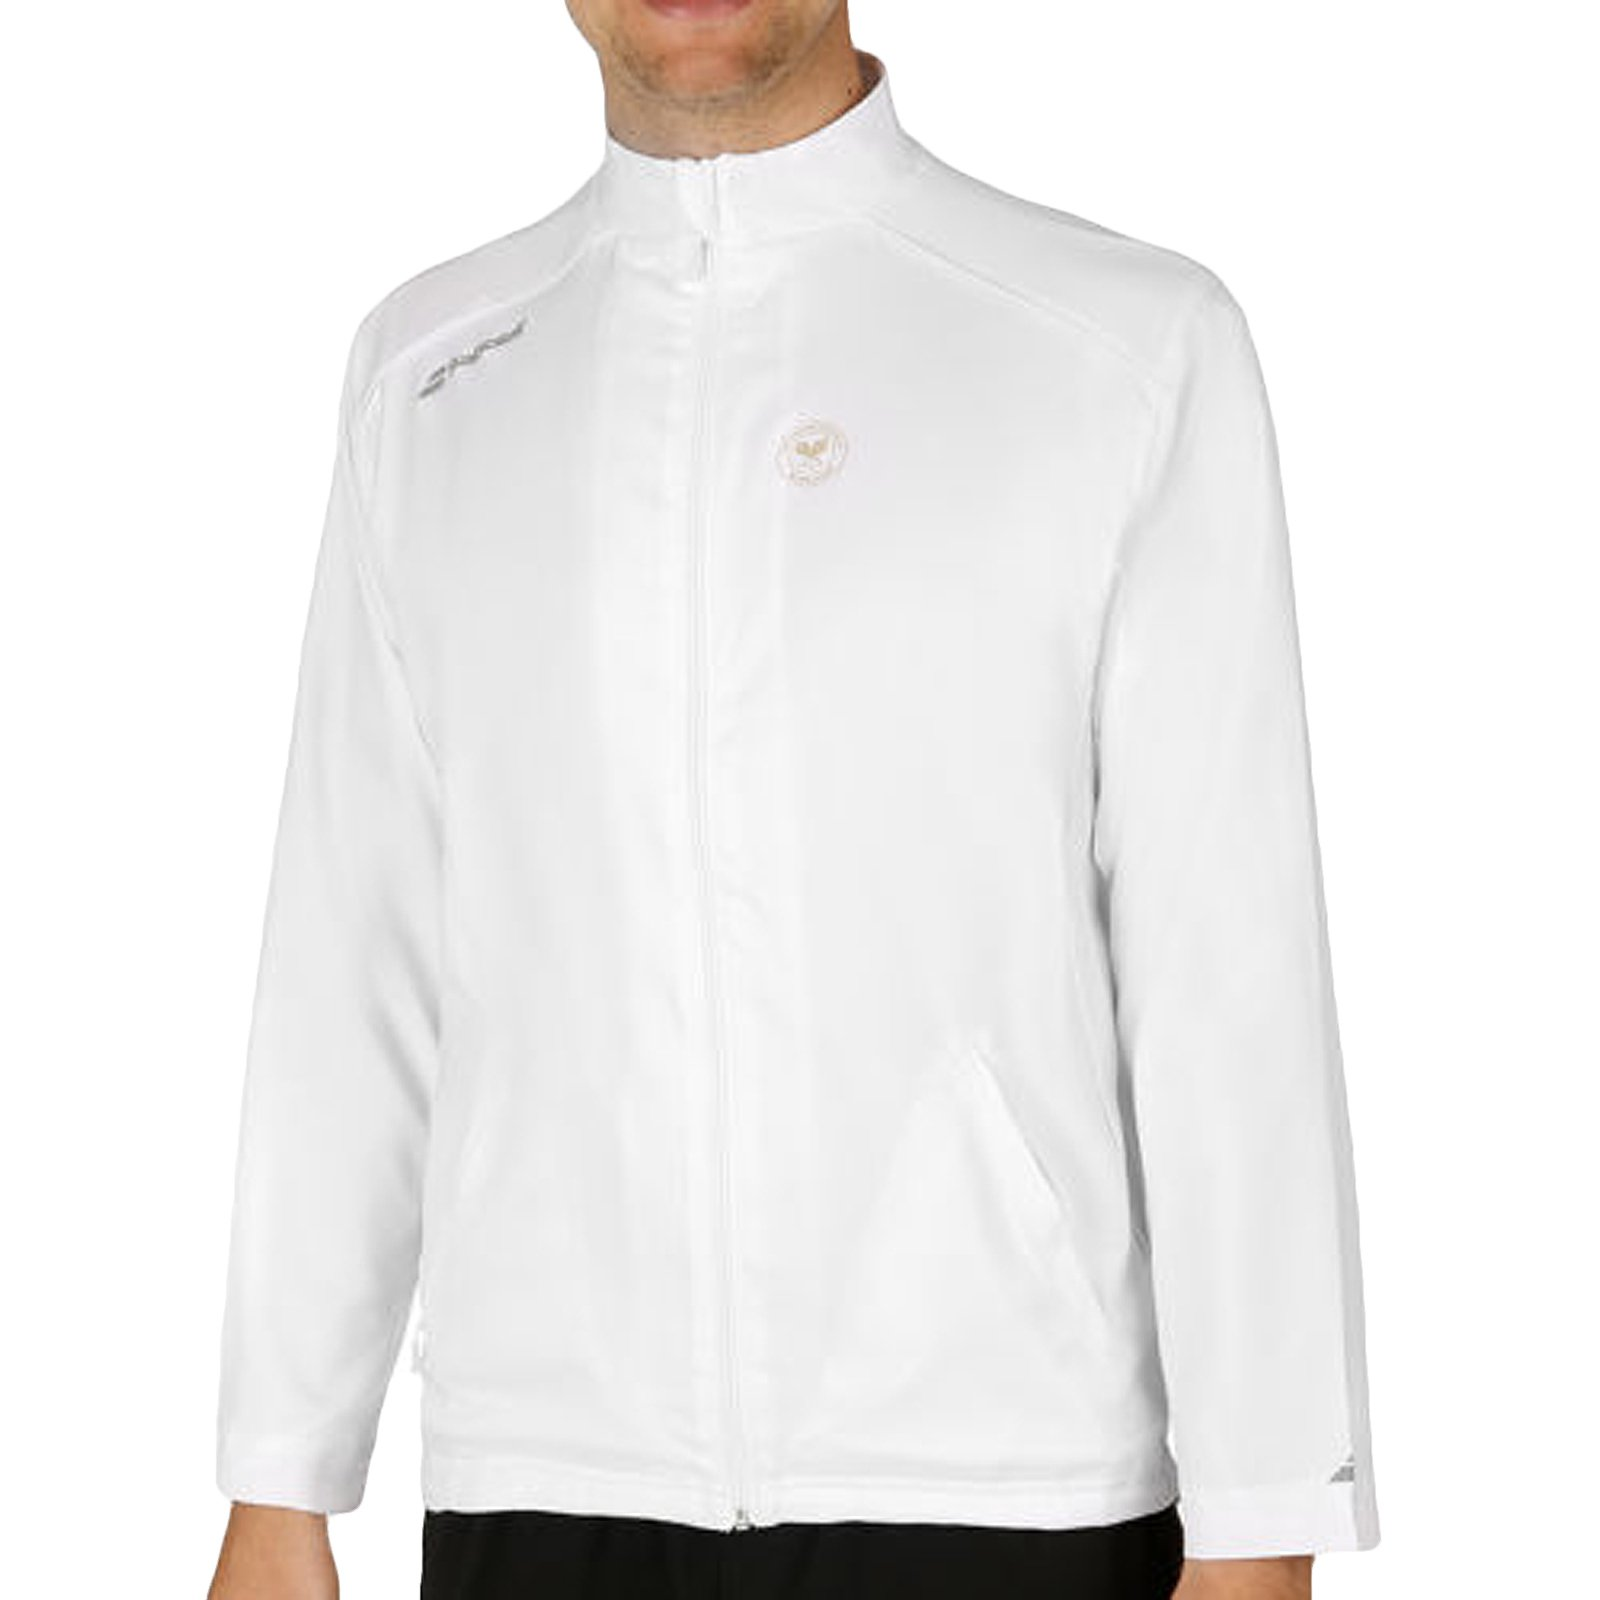 Babolat-Men`s Wimbledon Core Tennis Jacket White-(3324921390017)